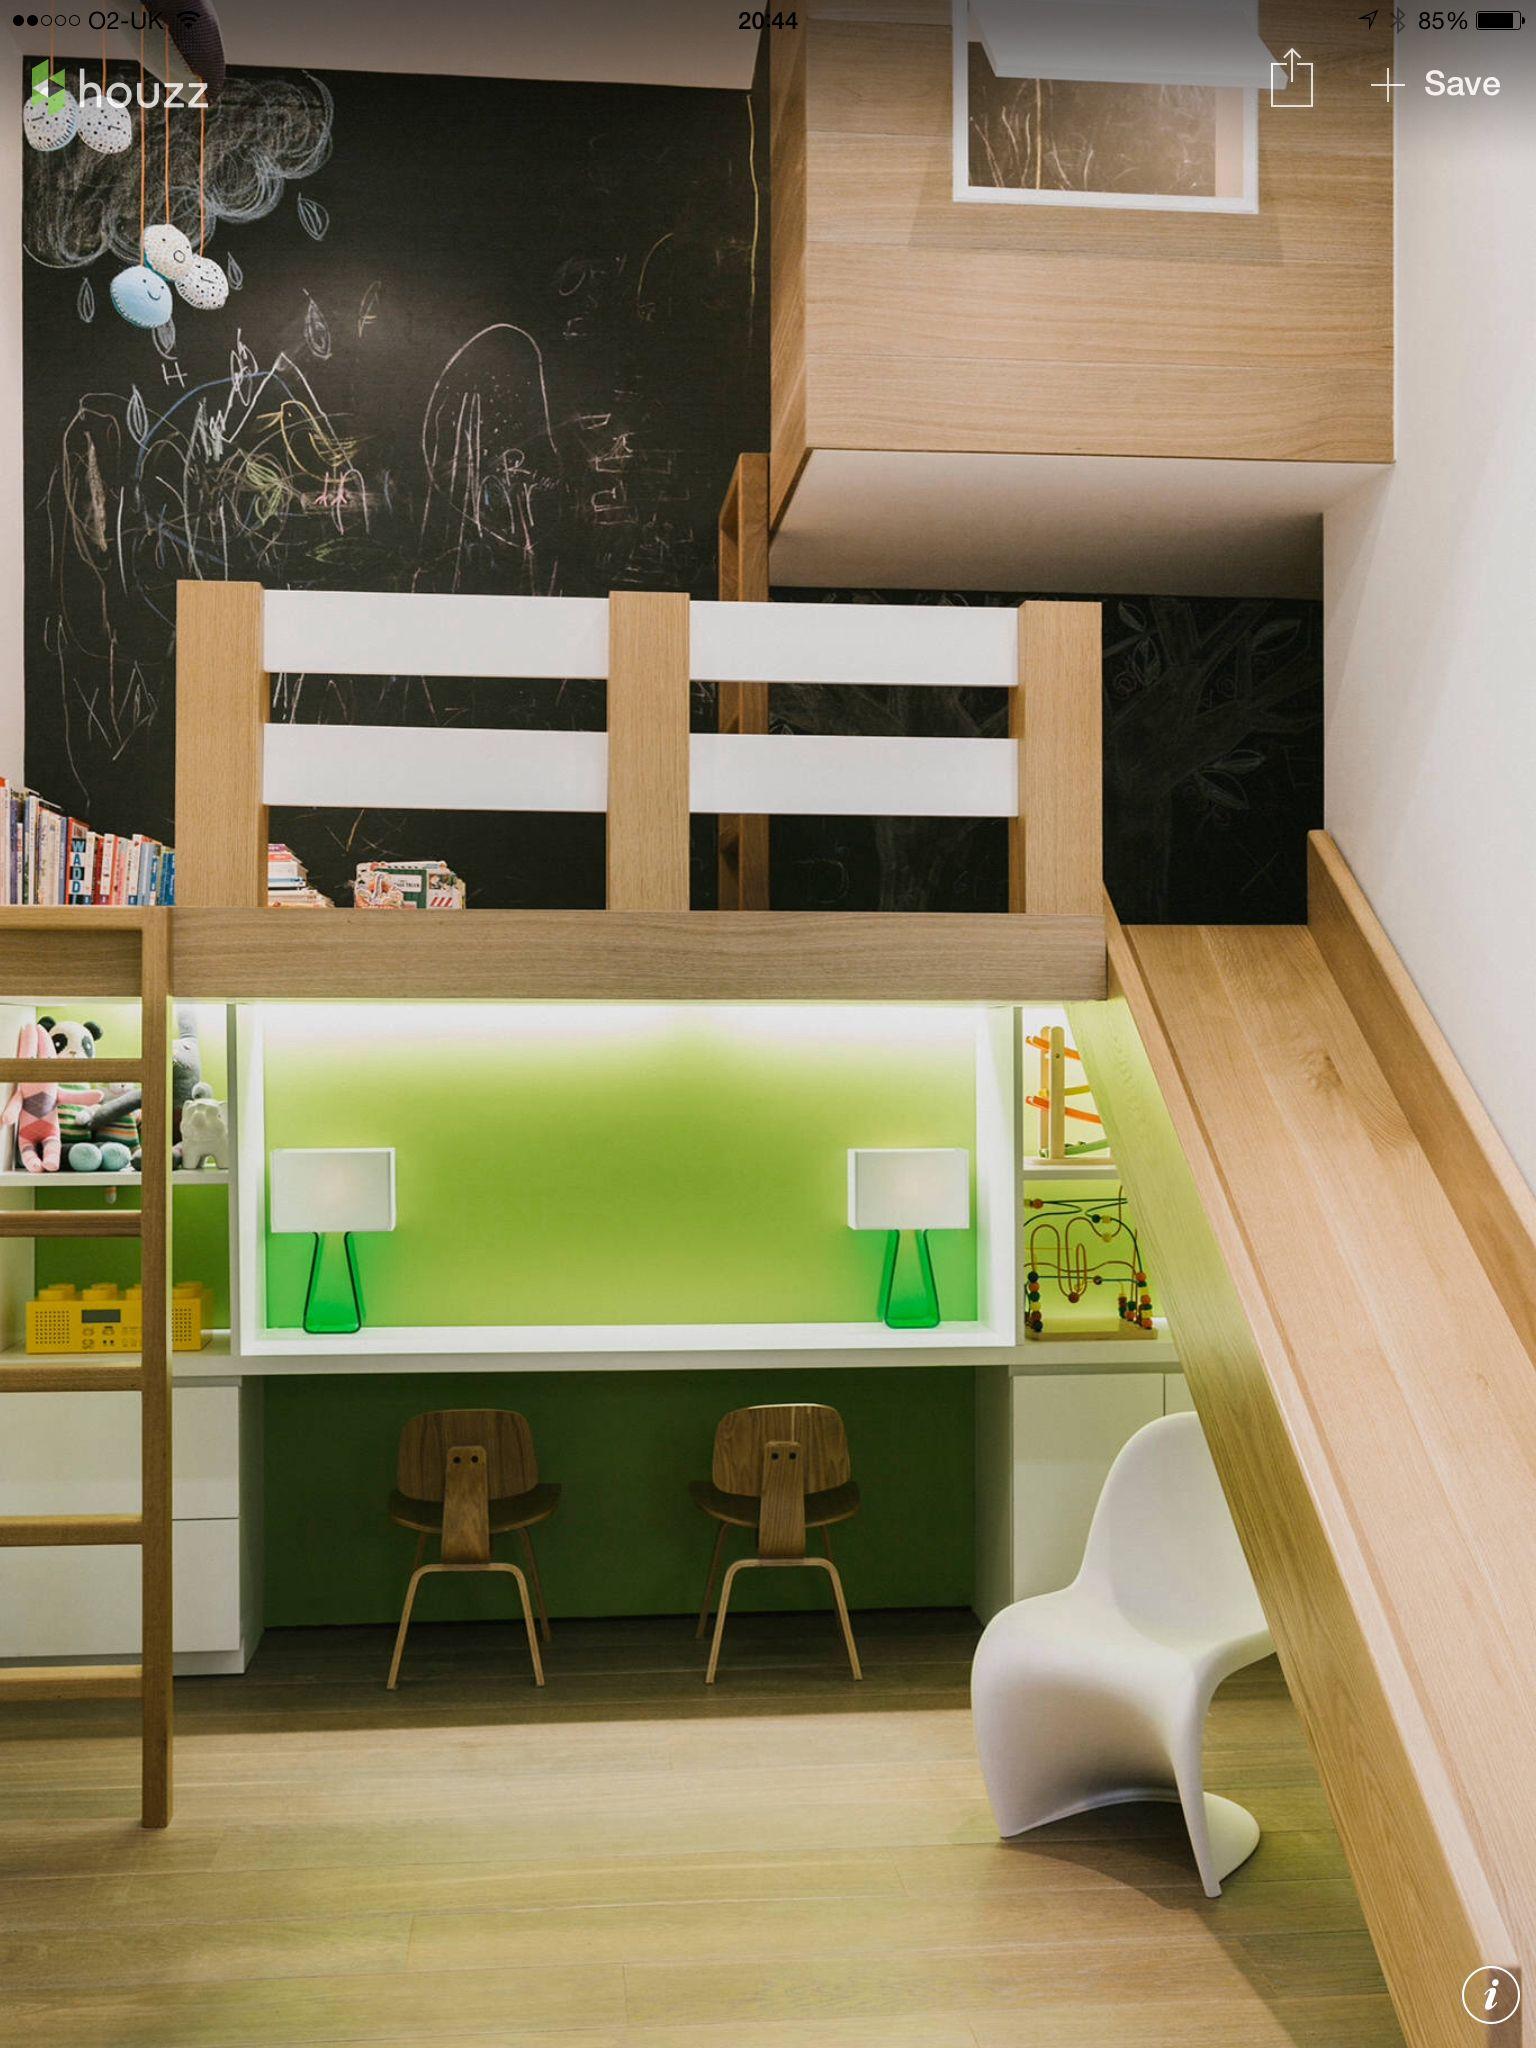 Loft bed ideas boys  Kids playroom  Bedroom  Pinterest  Playrooms Kids rooms and Room